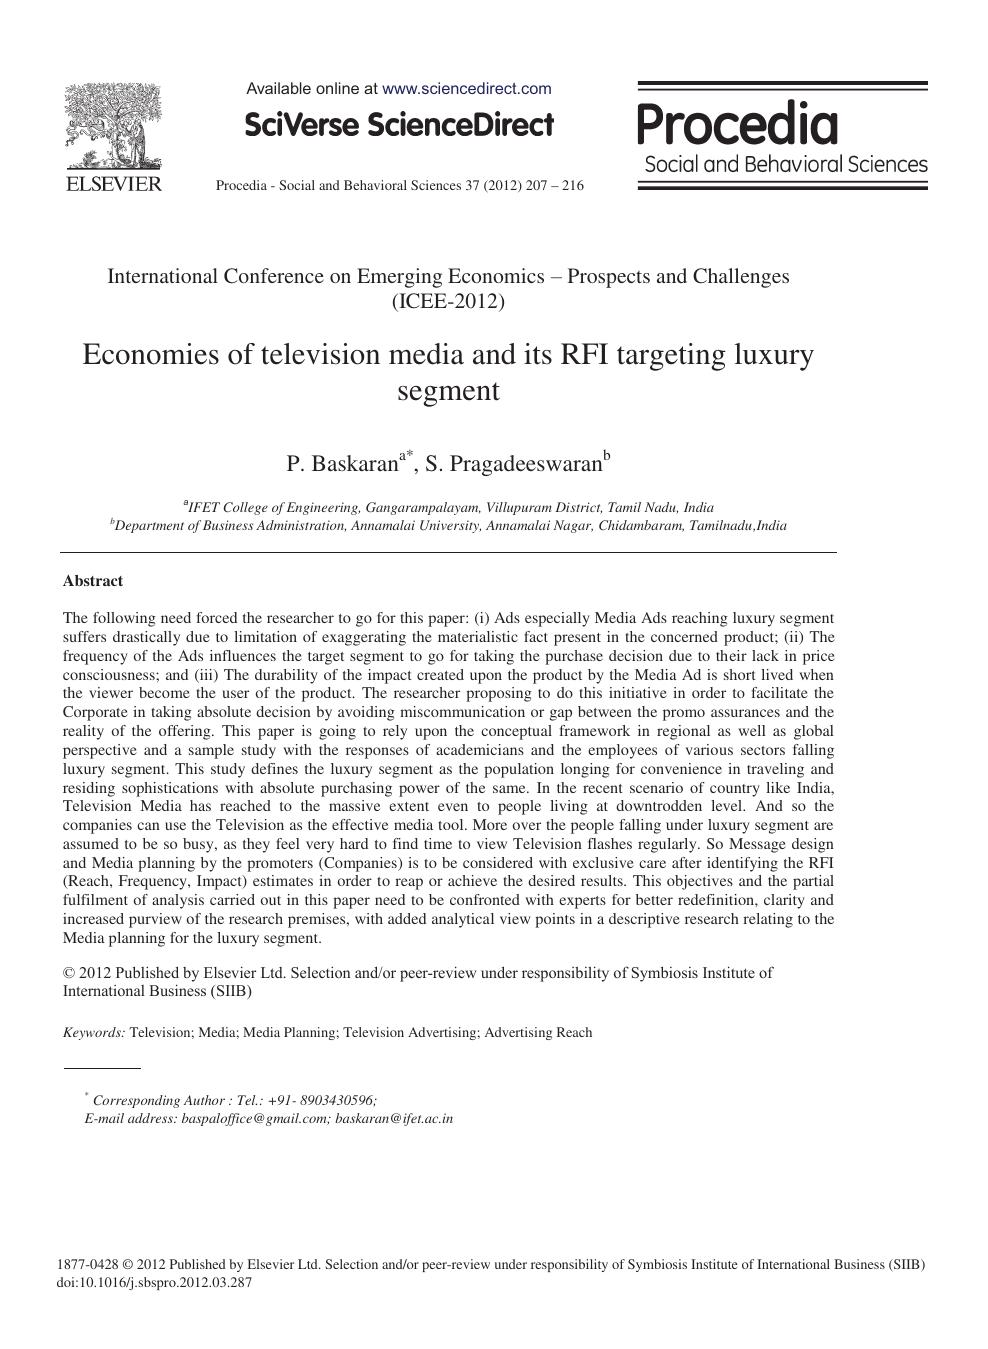 Economies of Television Media and its RFI Targeting Luxury Segment